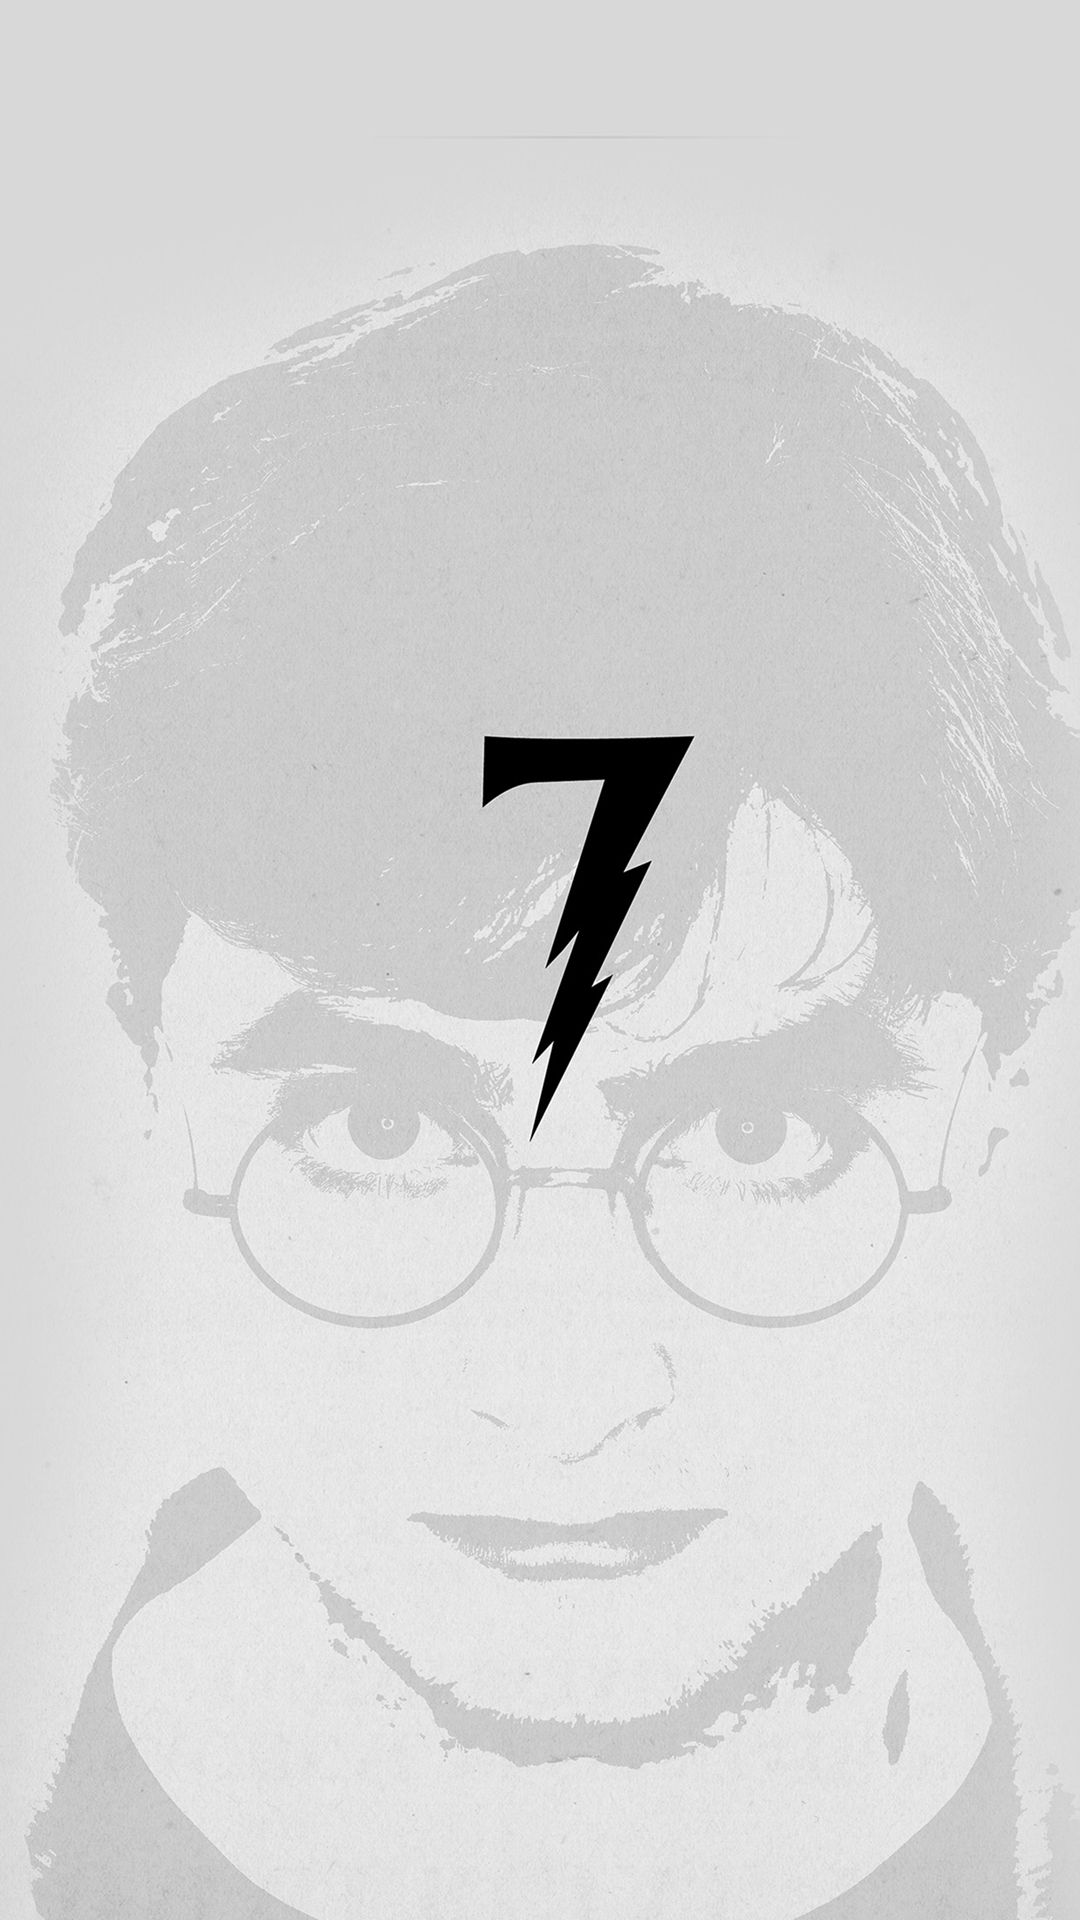 Harry Potter Art Minimal Film Gray Iphone 8 Wallpapers Harry Potter Wallpaper Filmes